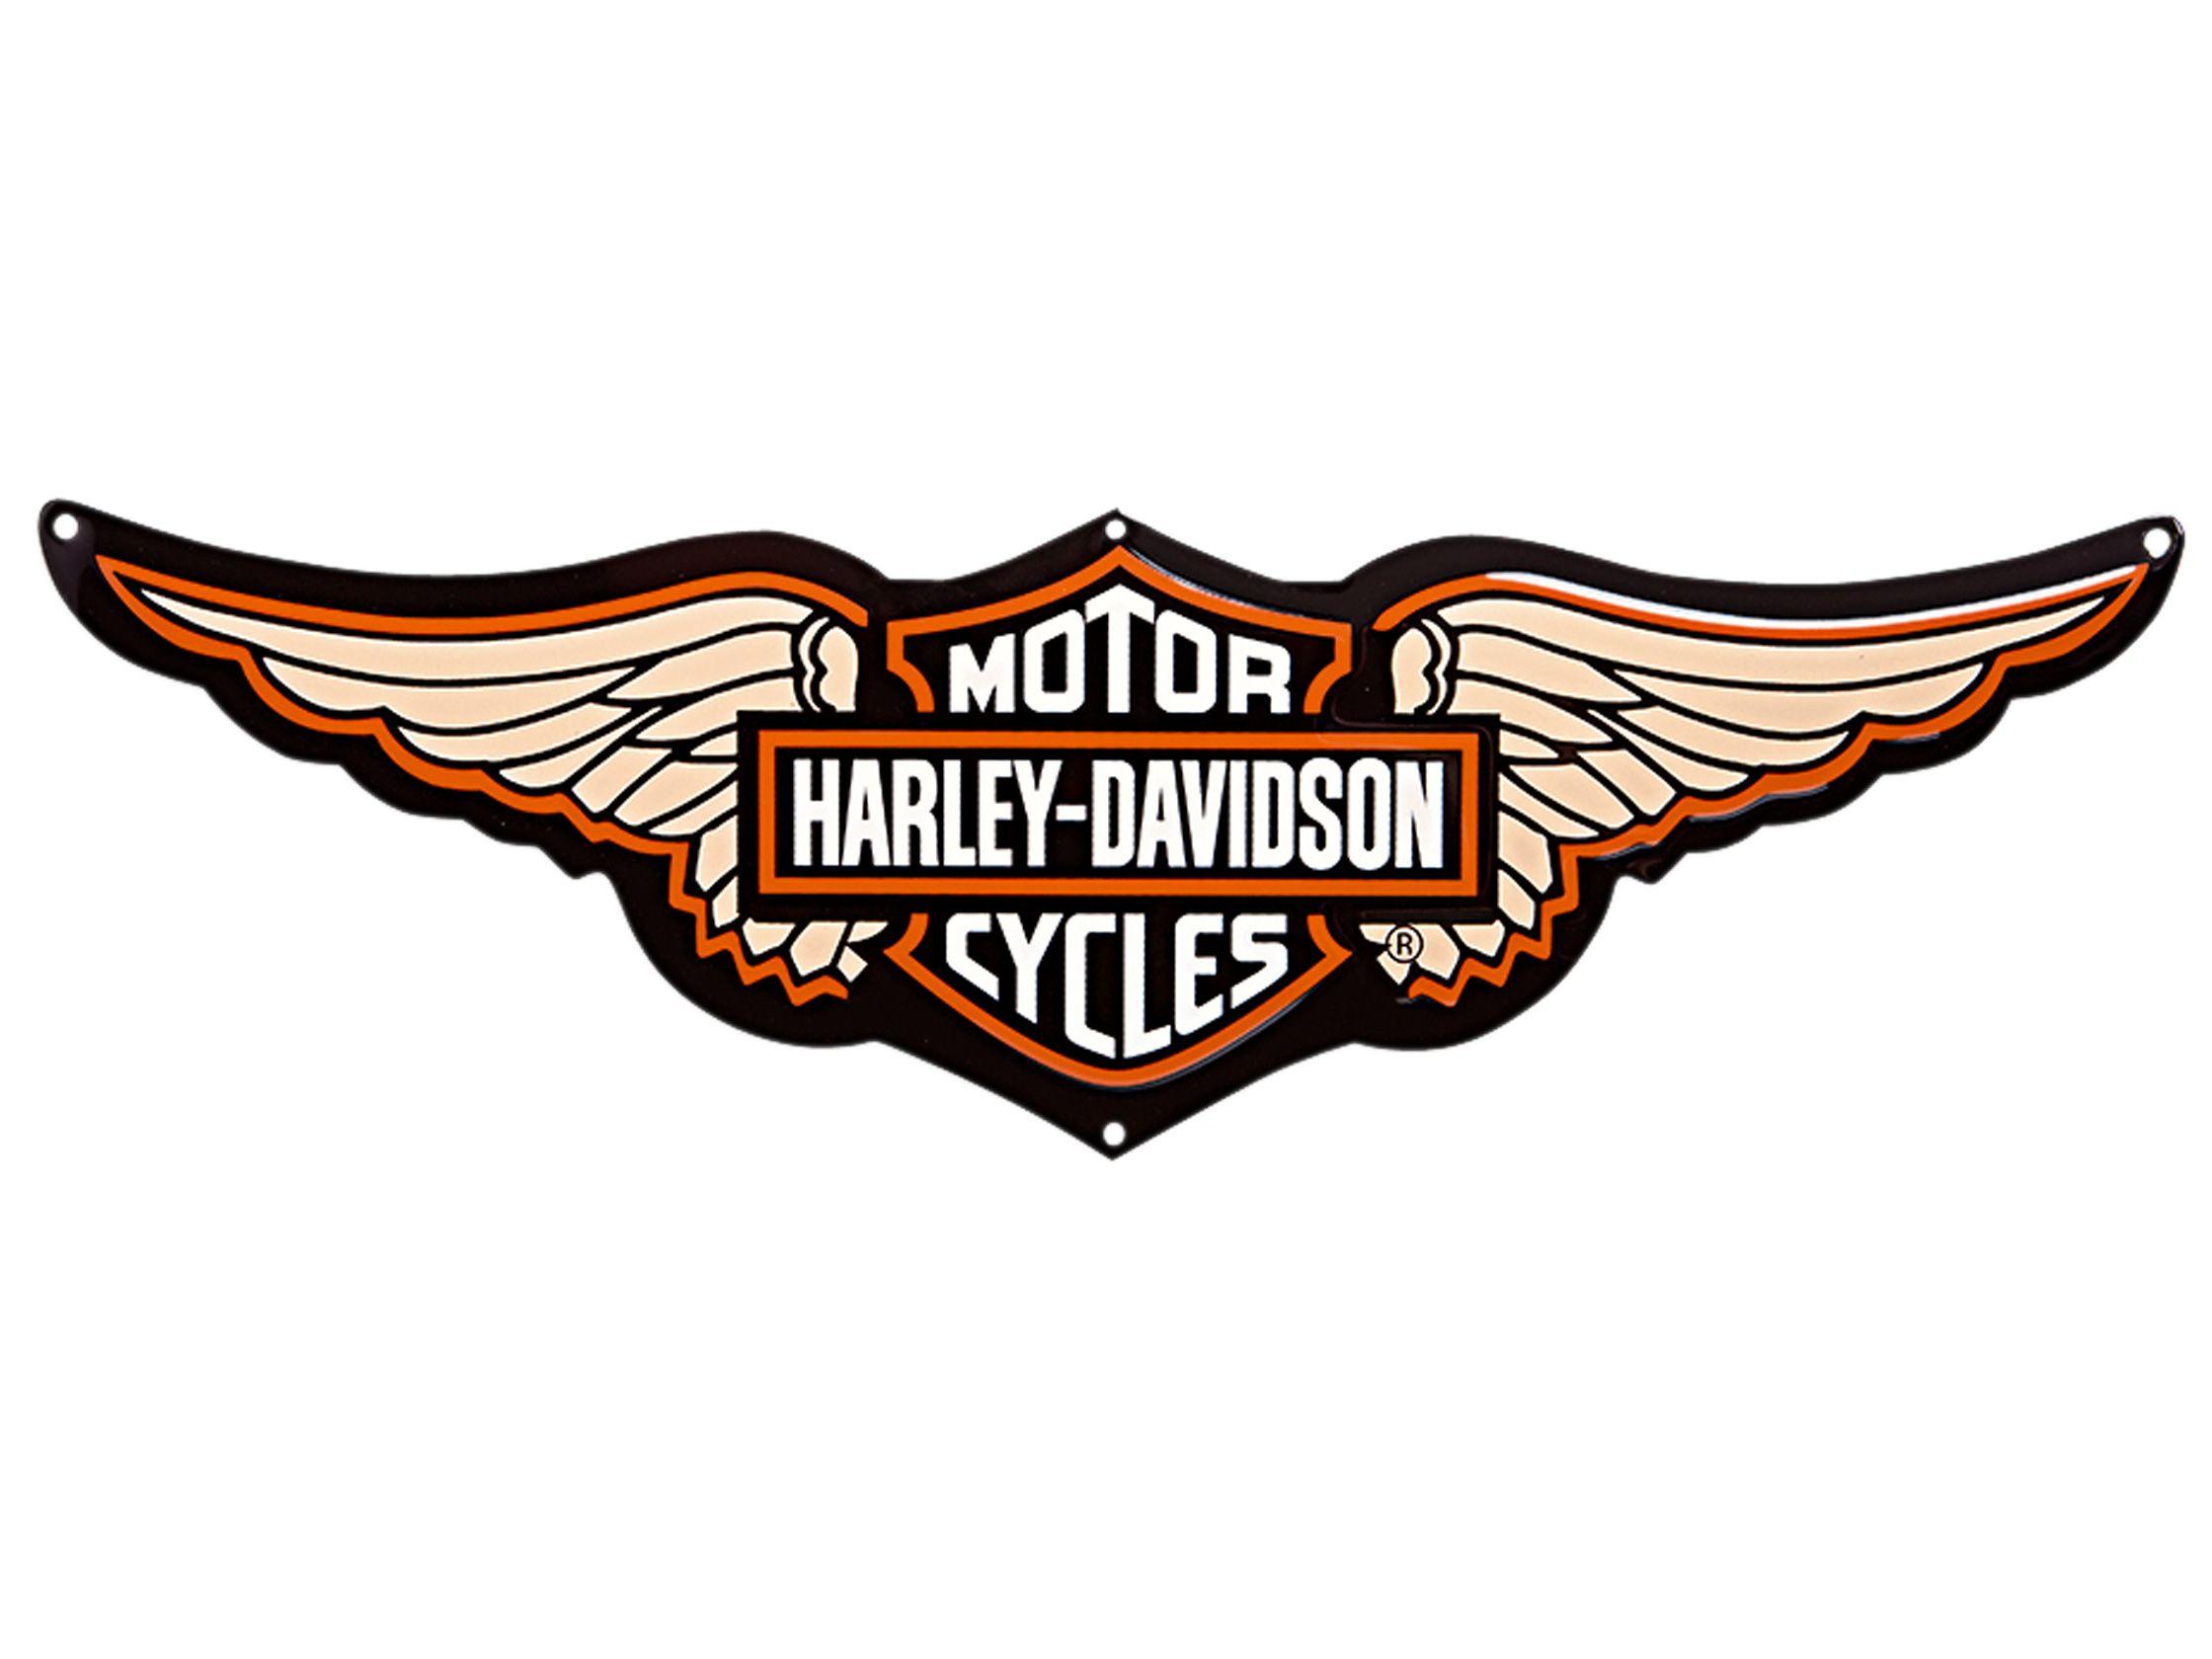 Harley Davidson Logo Images Wallpaper HD  Wallpaper - Stickers for motorcycles harley davidsons